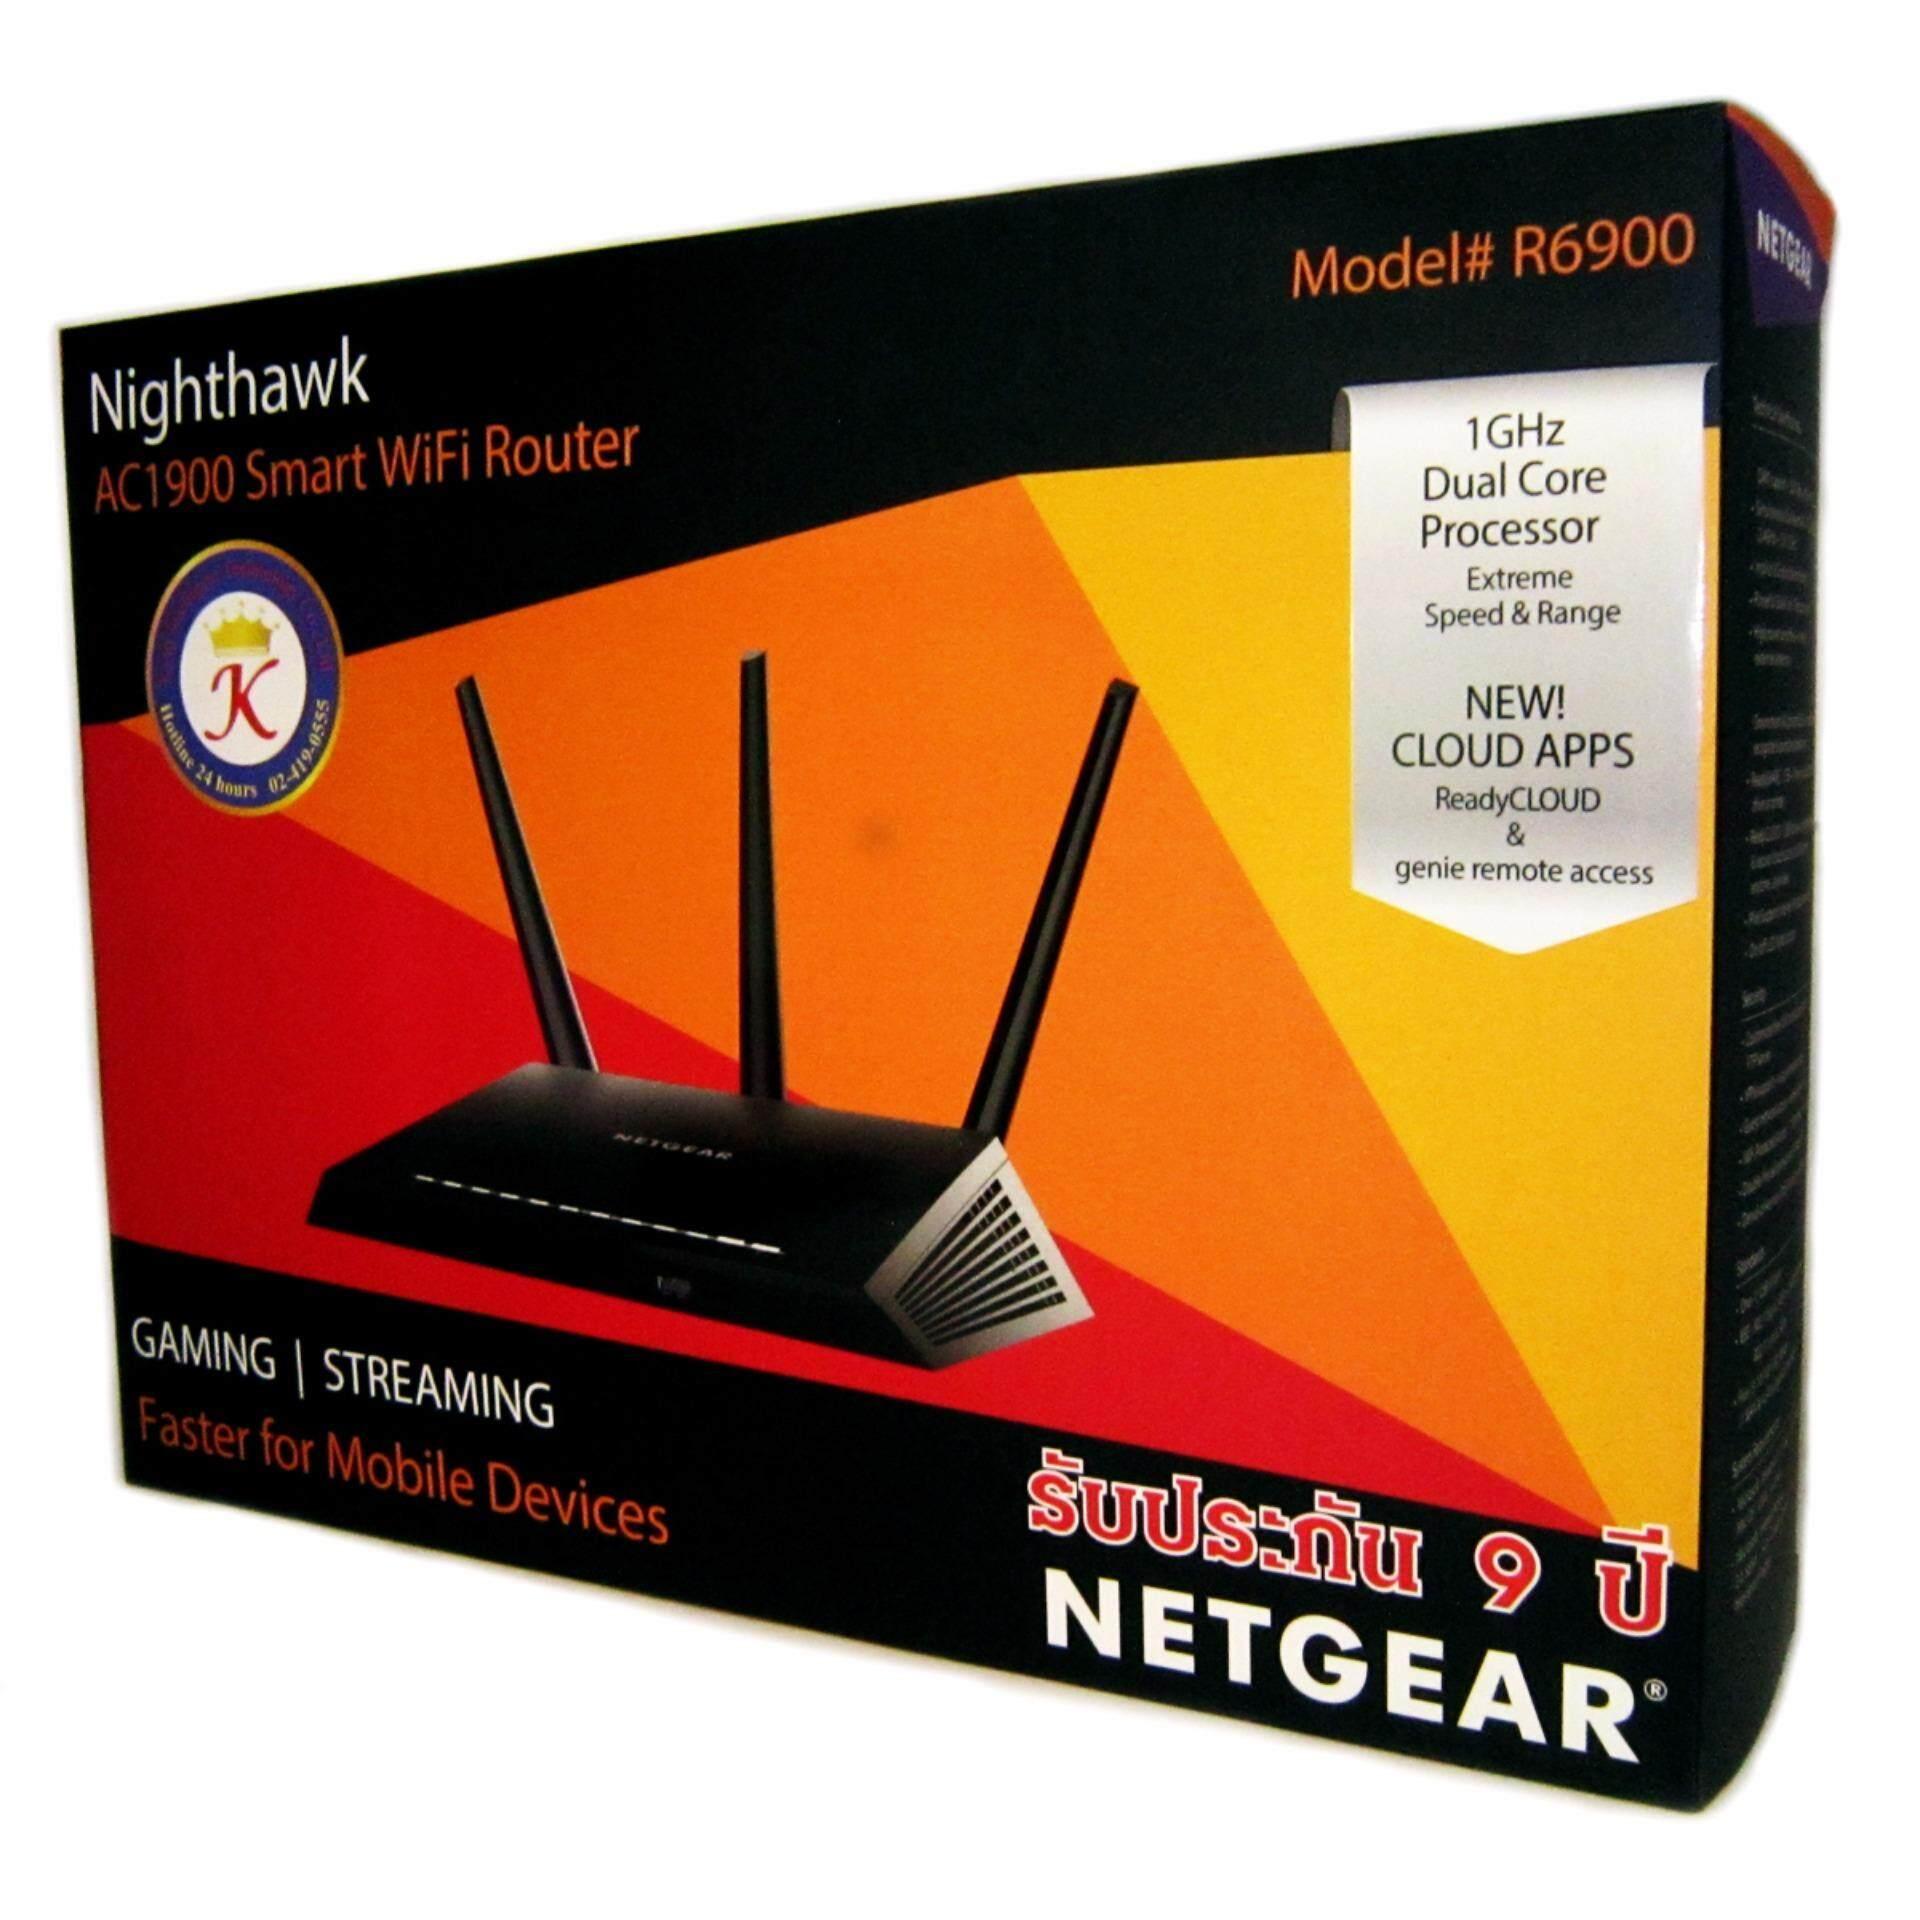 Netgear R6900 ส่งโดยKERRYประกัน 9ปี(KIT) Nighthawk AC1900 Smart WiFi Router